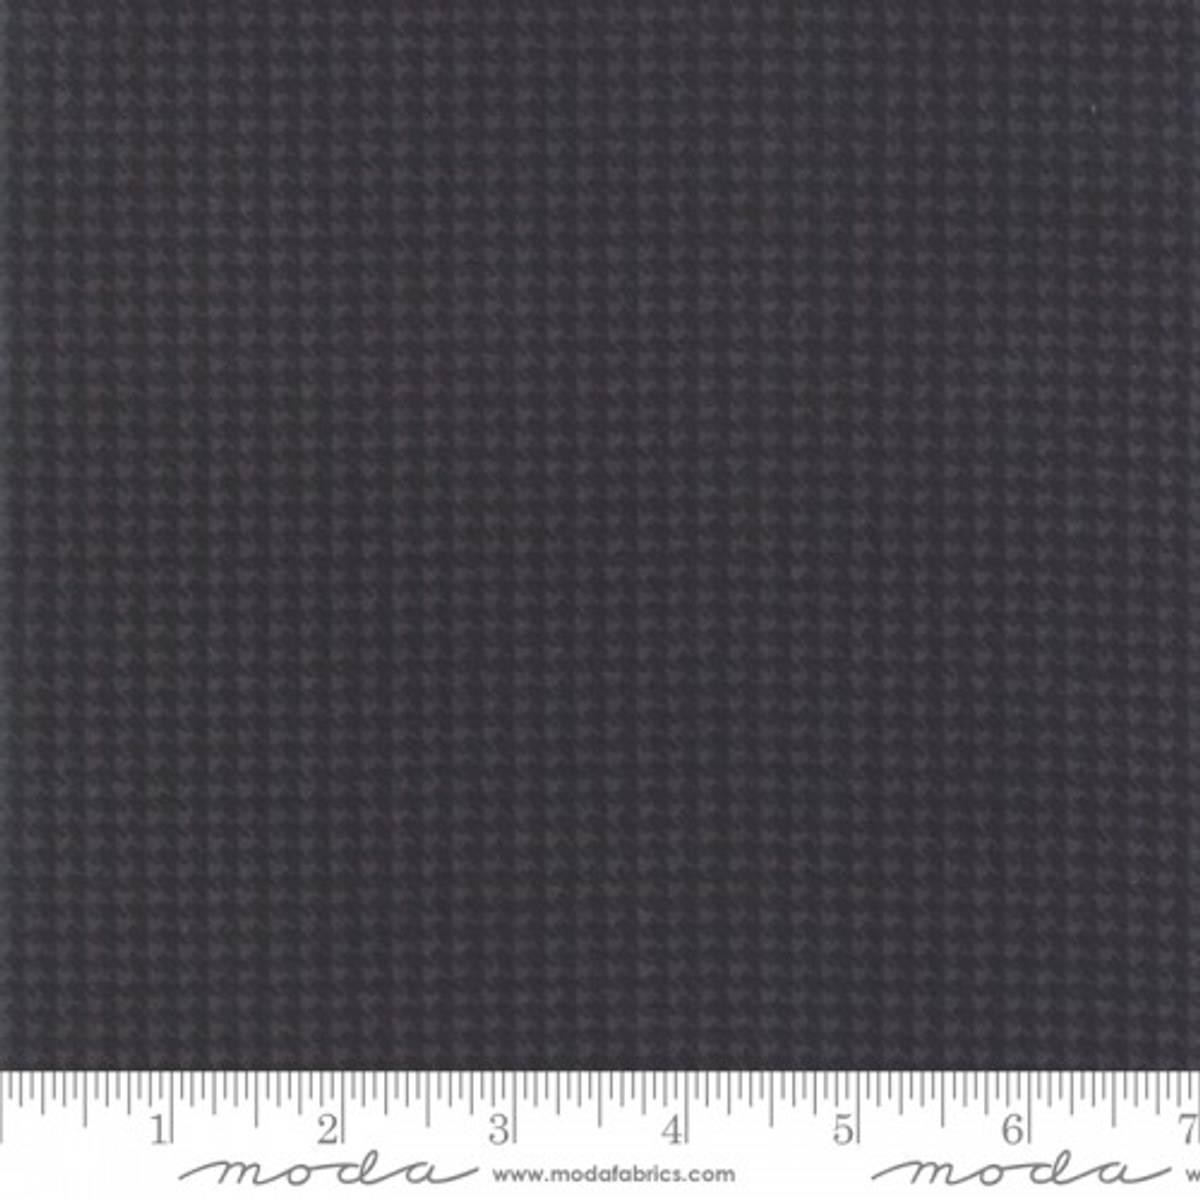 Moda Fabrics Farmhouse Flannels II, 49106 21F